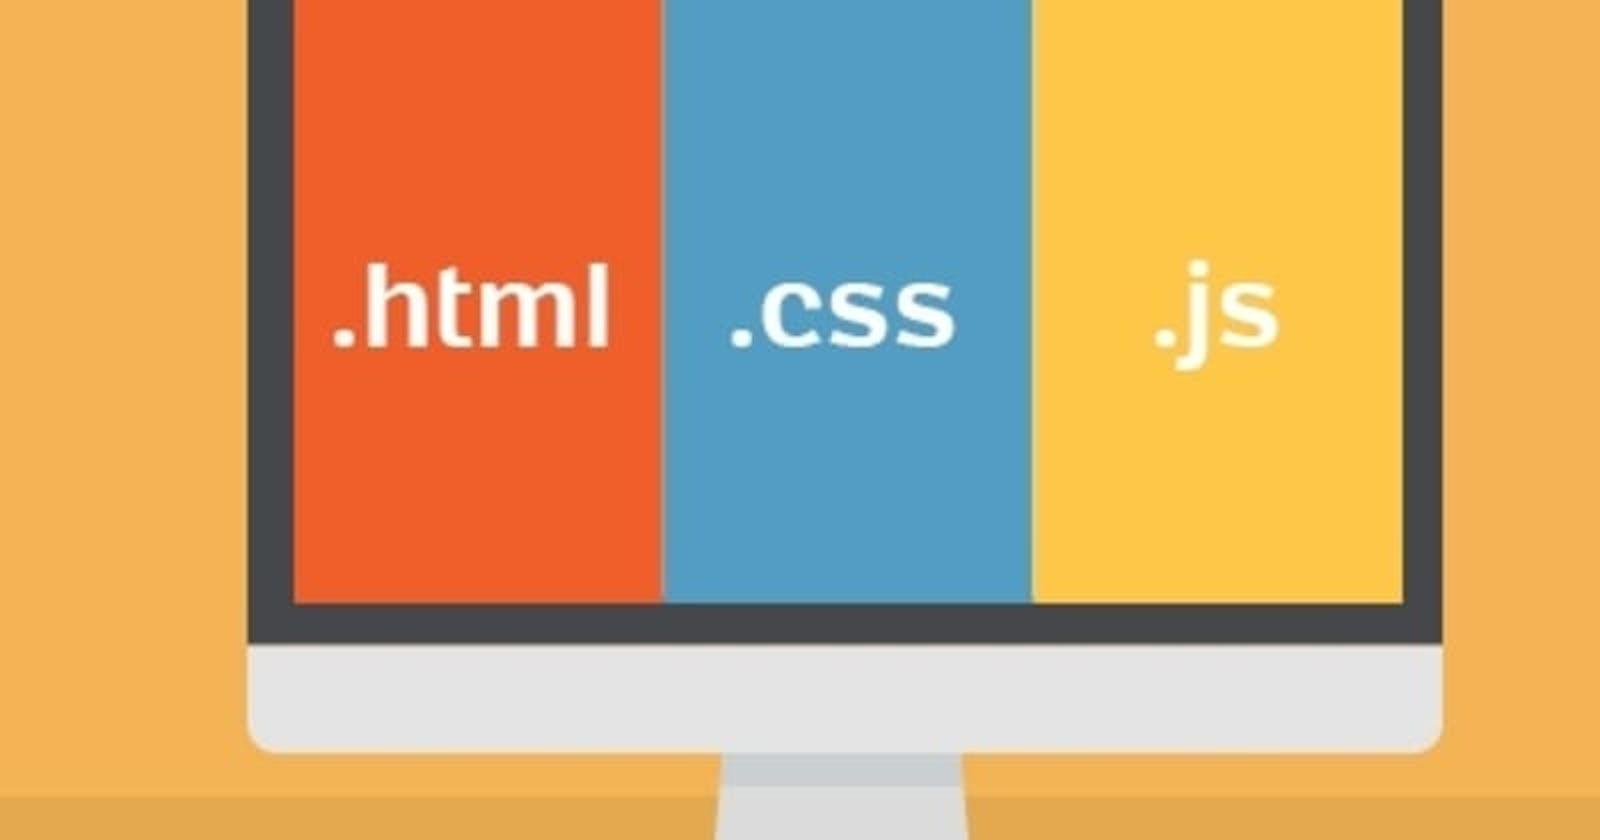 Web basics: sending HTML, CSS and Javascript content through HTTP